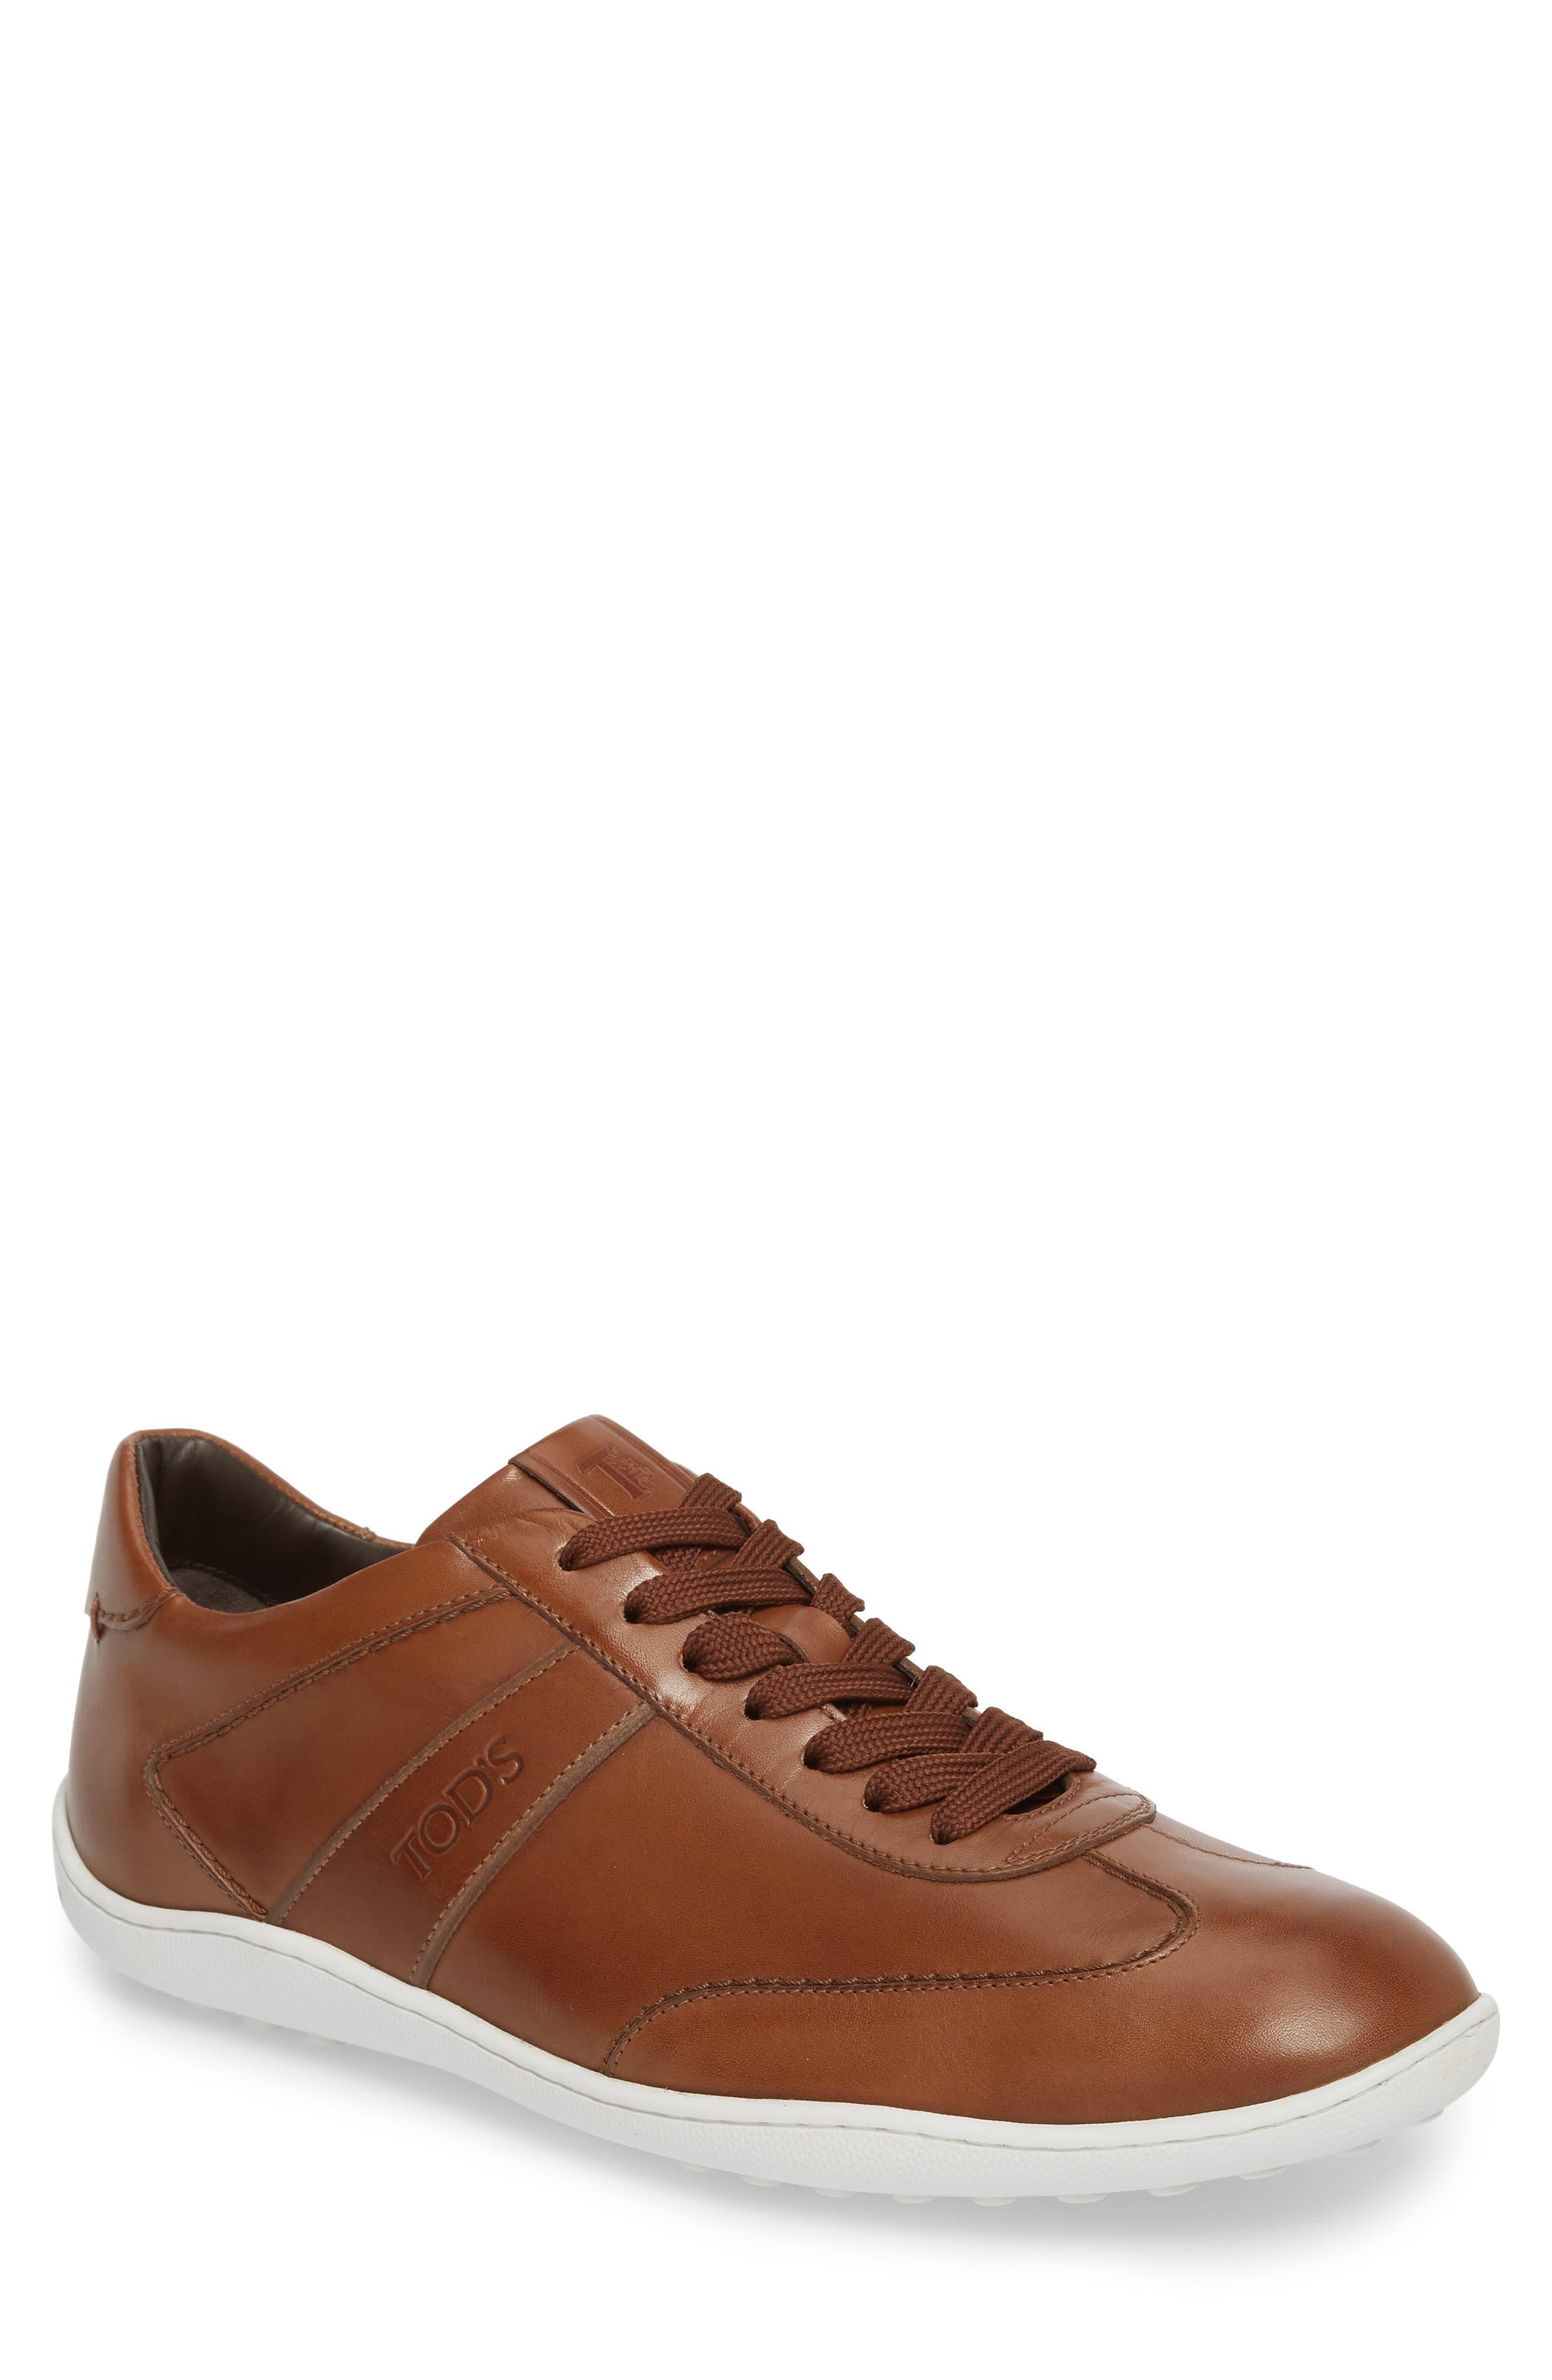 Owen Sneaker,                             Main thumbnail 1, color,                             200